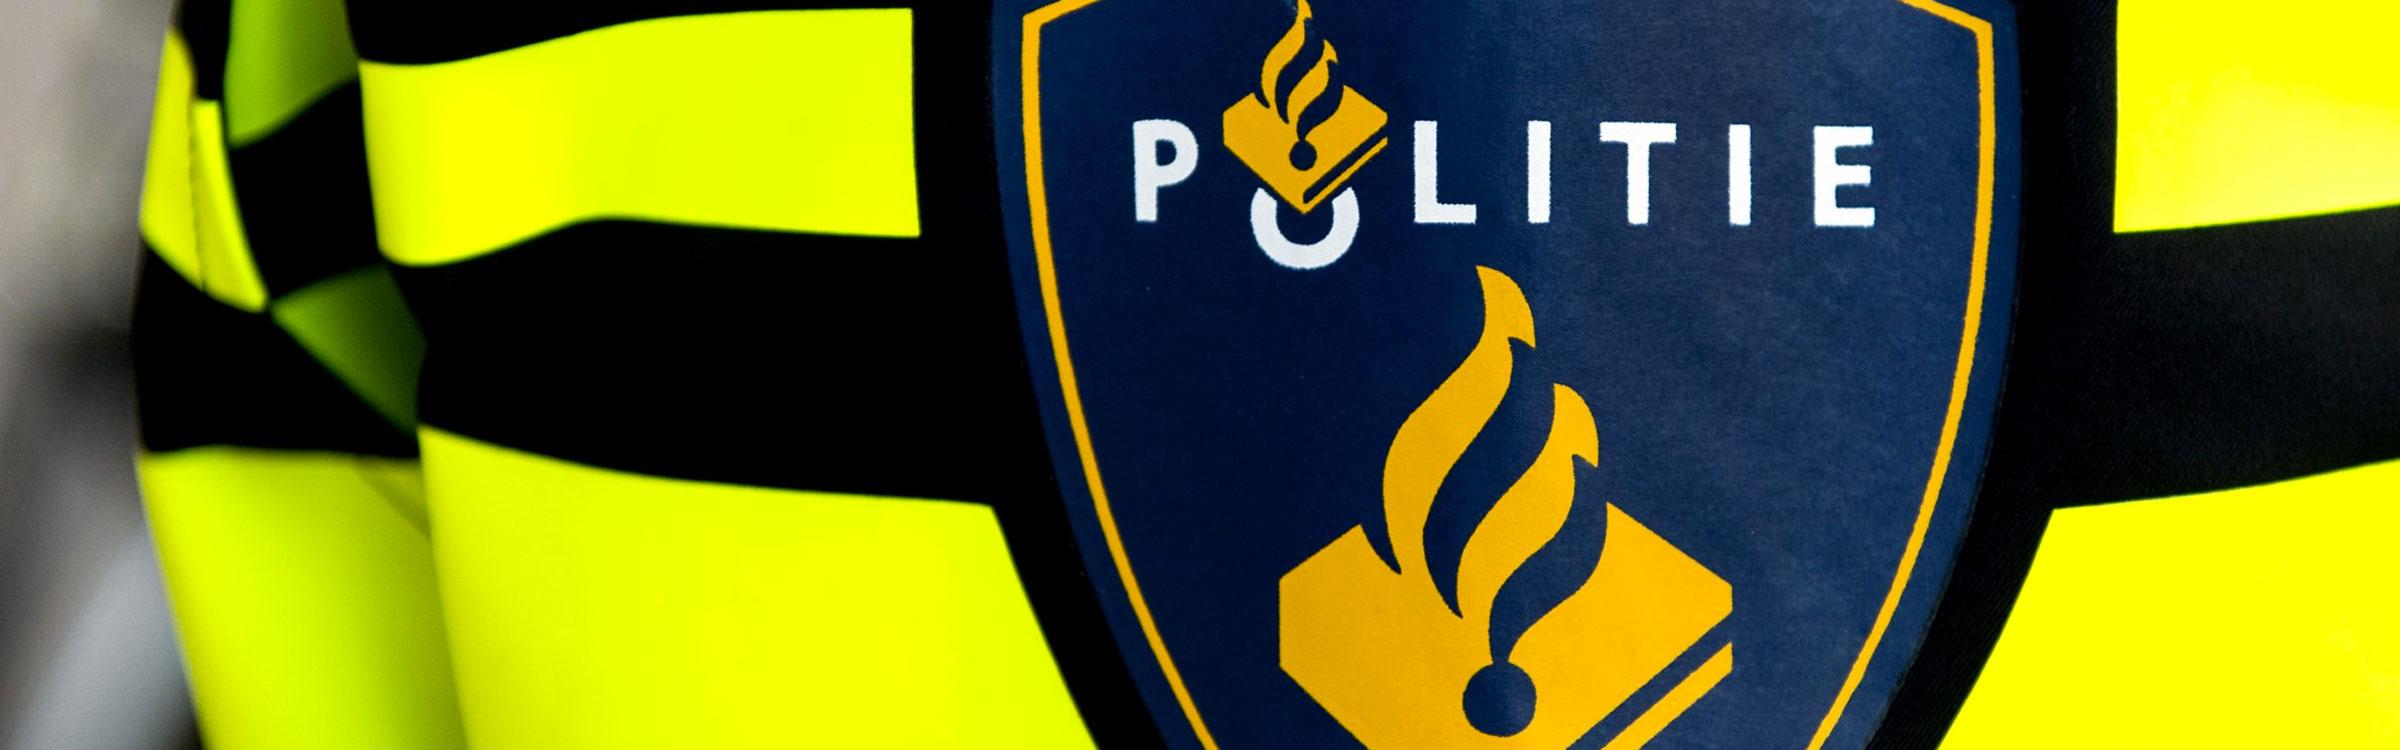 Politie2